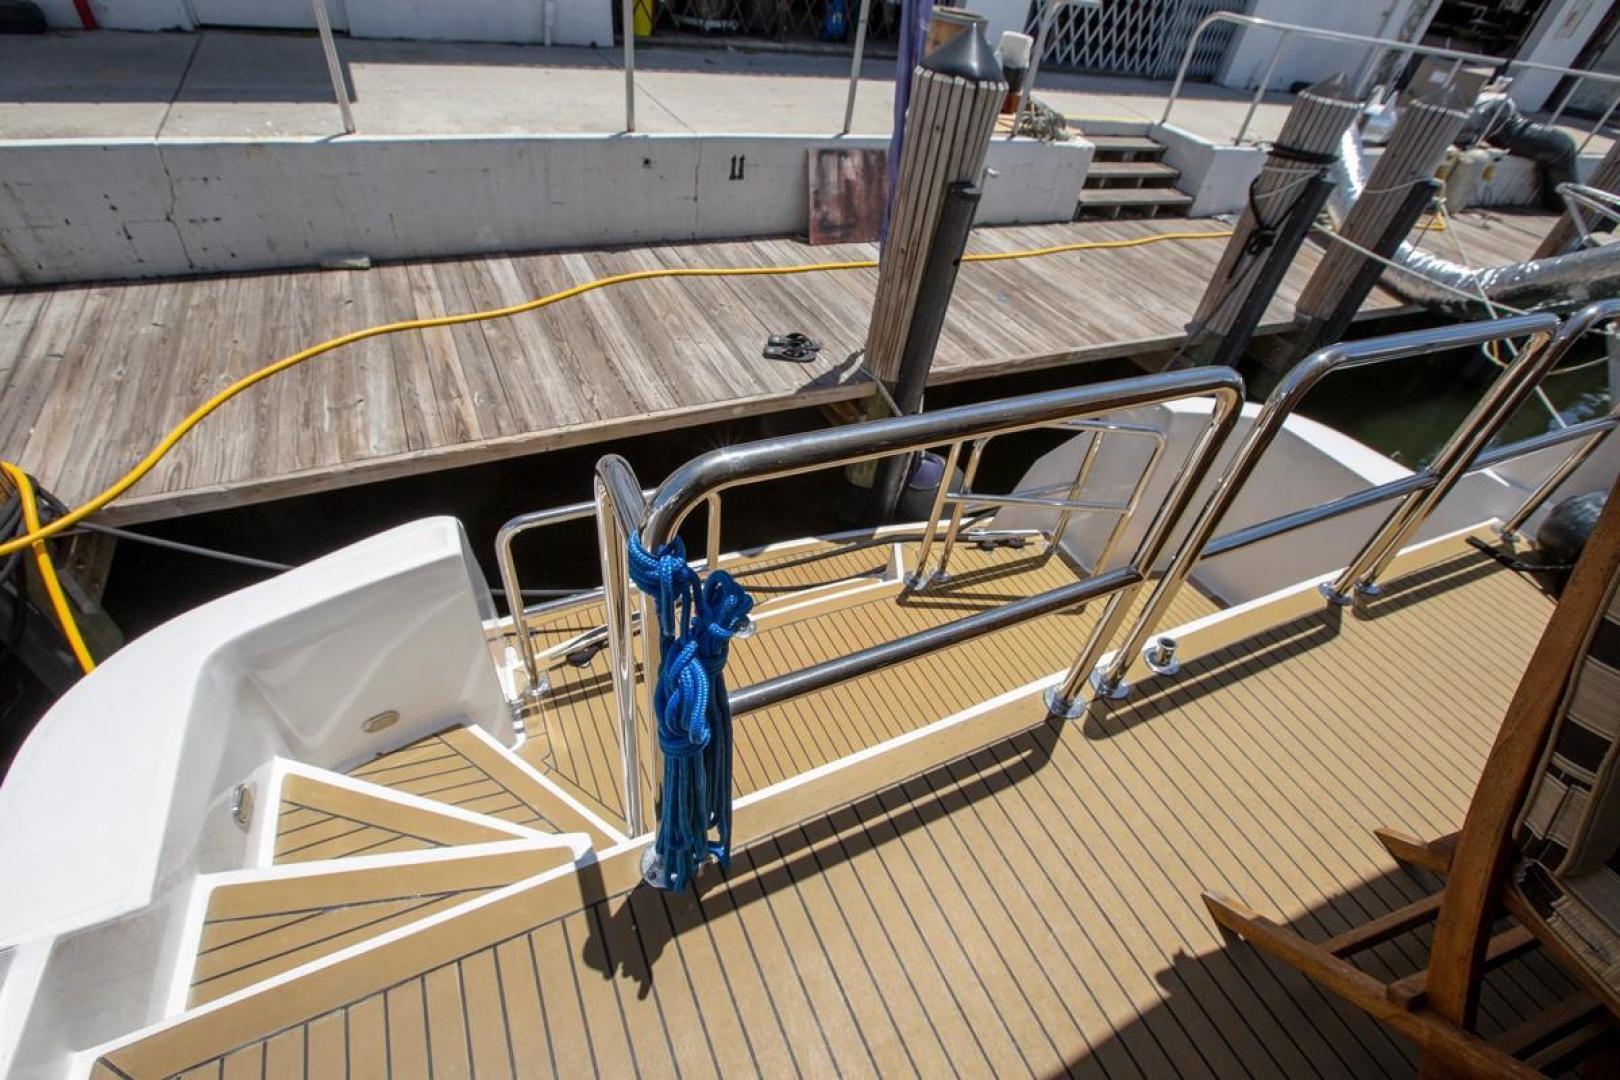 Hatteras-Cockpit Motor Yacht 2000-Getaway Ft. Lauderdale-Florida-United States-977407 | Thumbnail